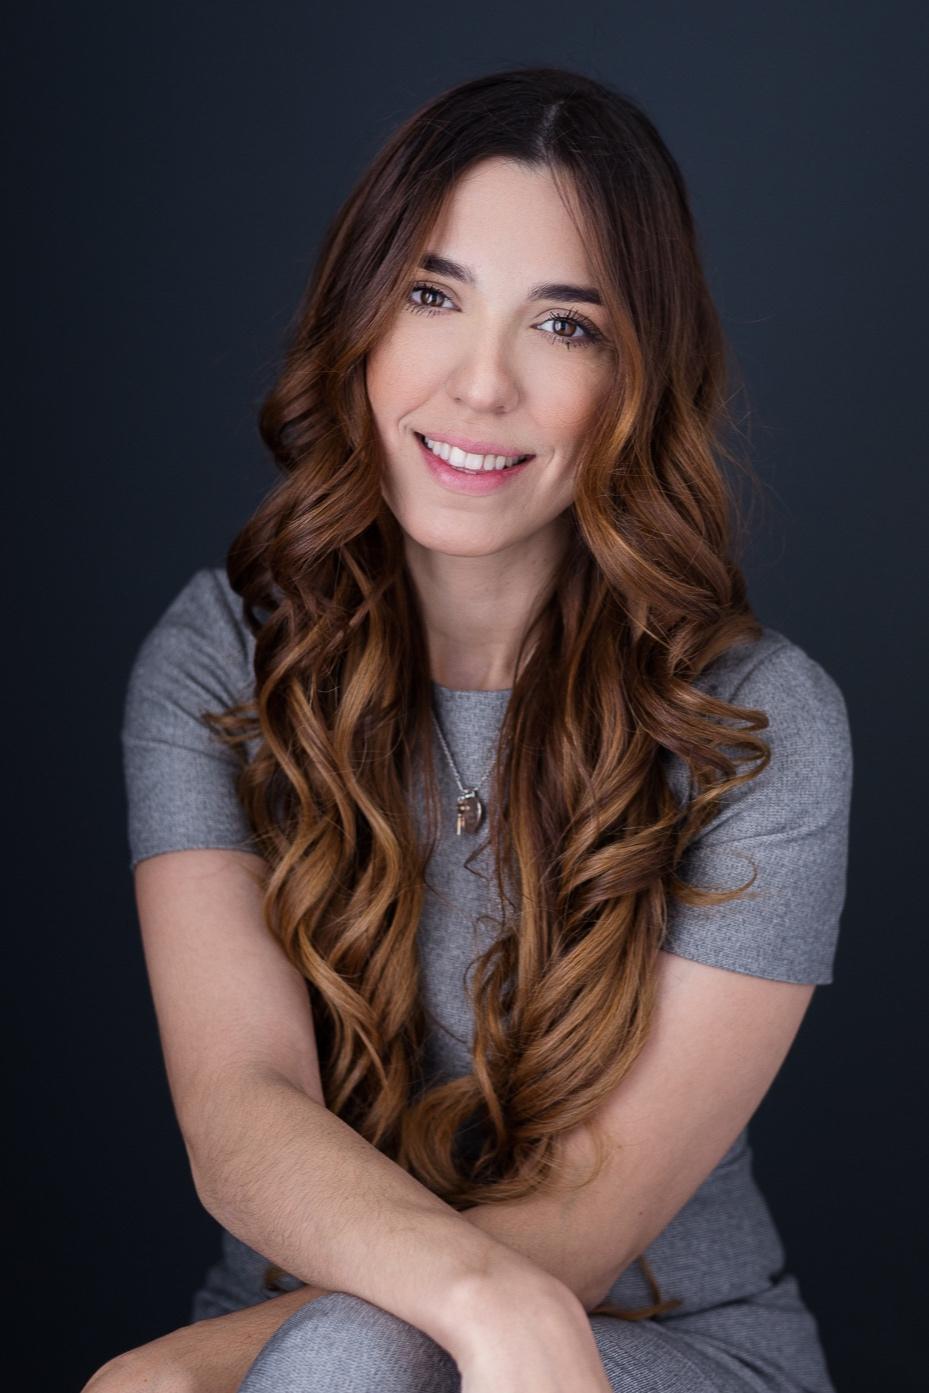 Zayda Gonzalez-Melissa Alcantar Fotografia Sesión de fotos